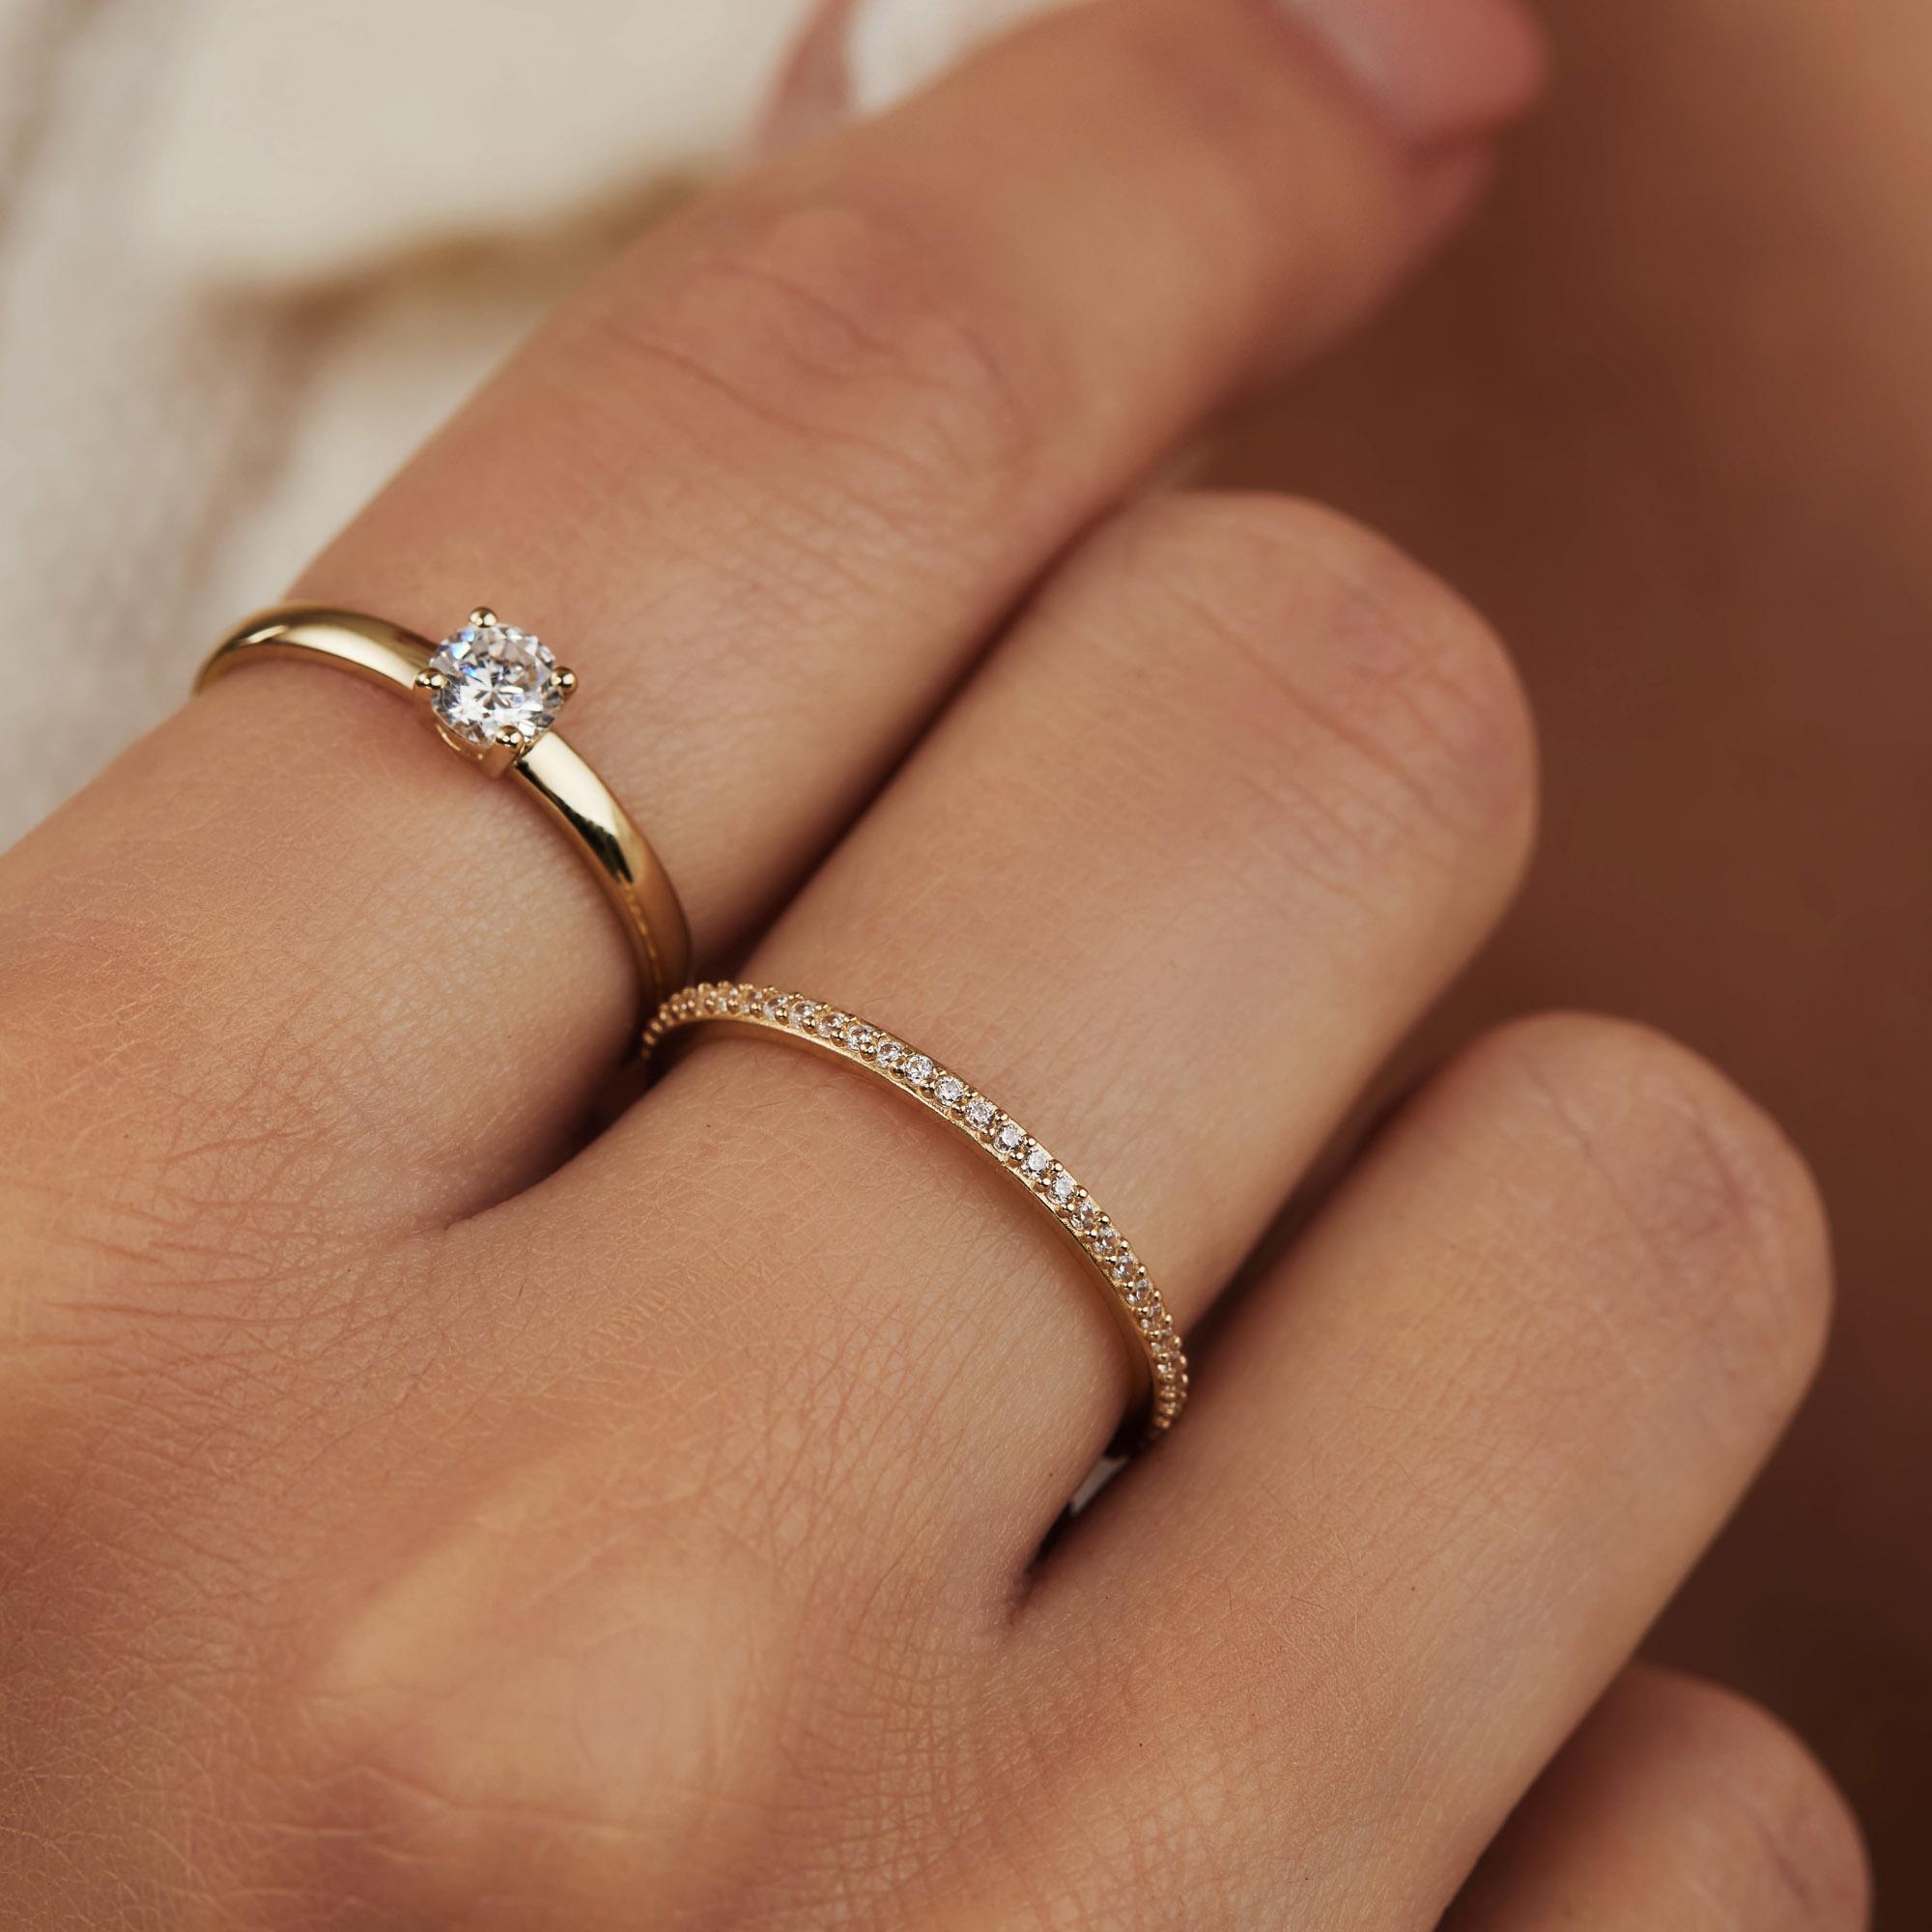 Isabel Bernard Asterope Stones 14 karaat gouden stacking ring met zirkonia